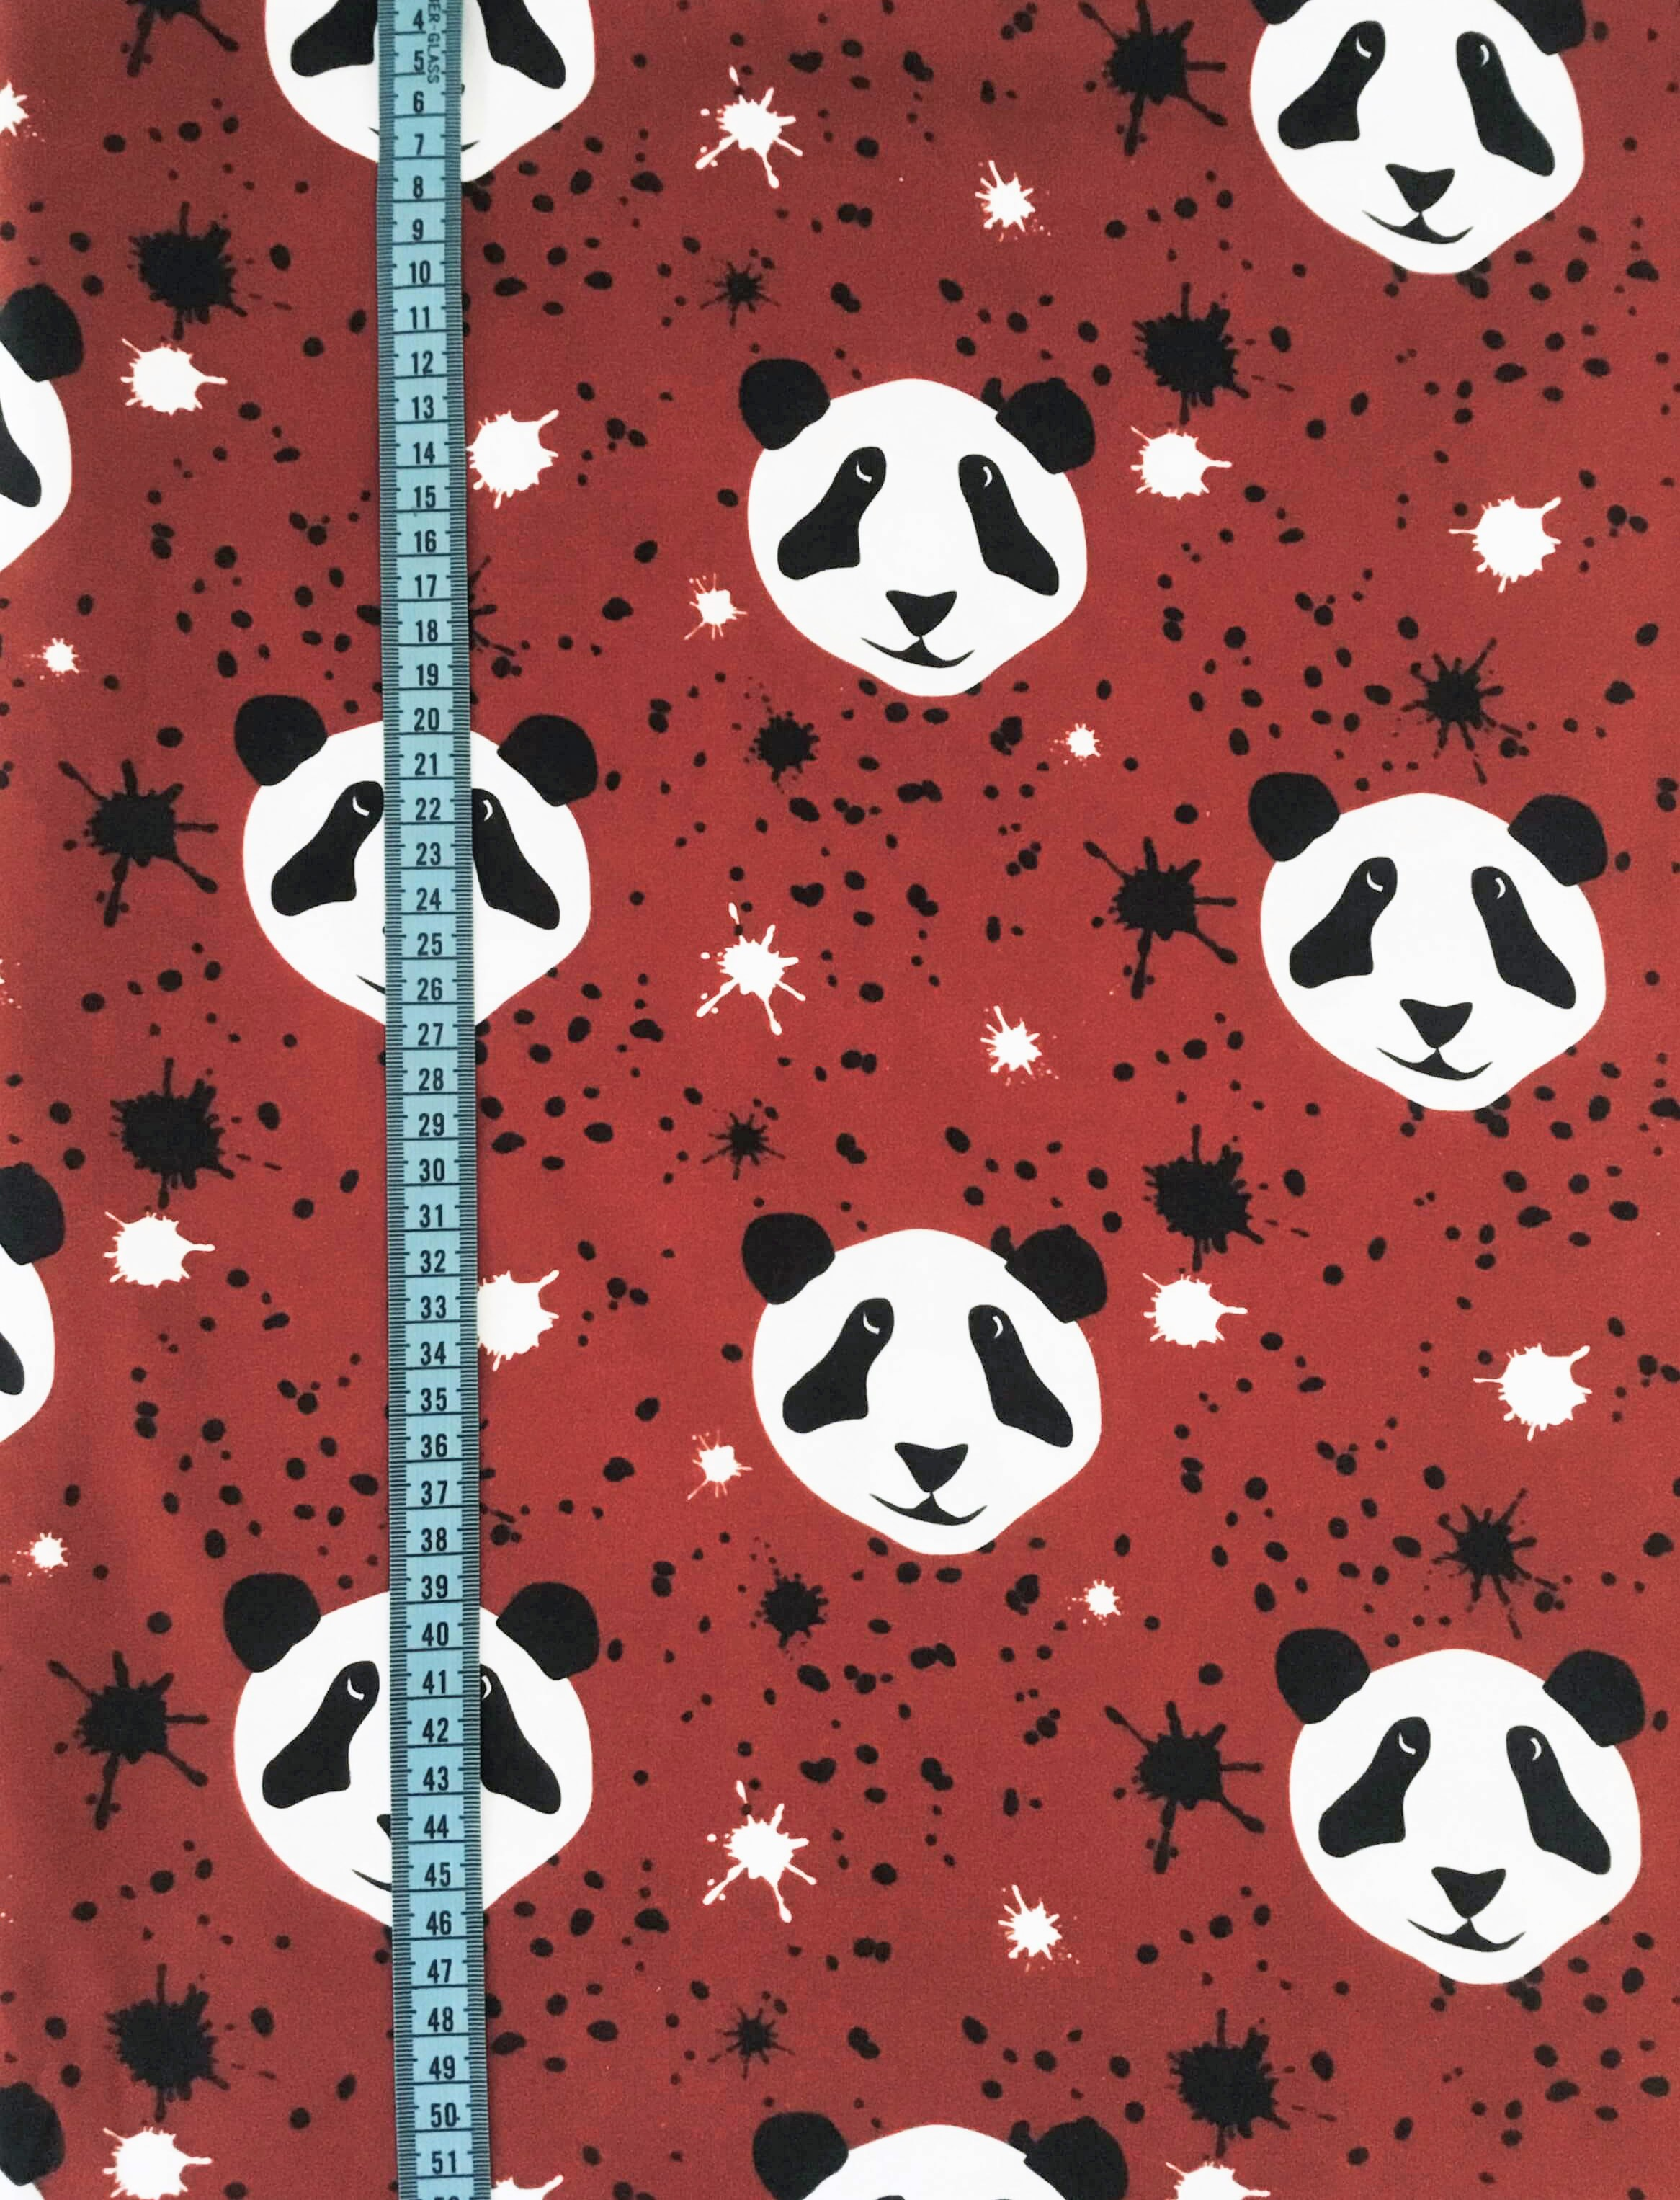 Splat! Panda, Rost #506, eko GOTS